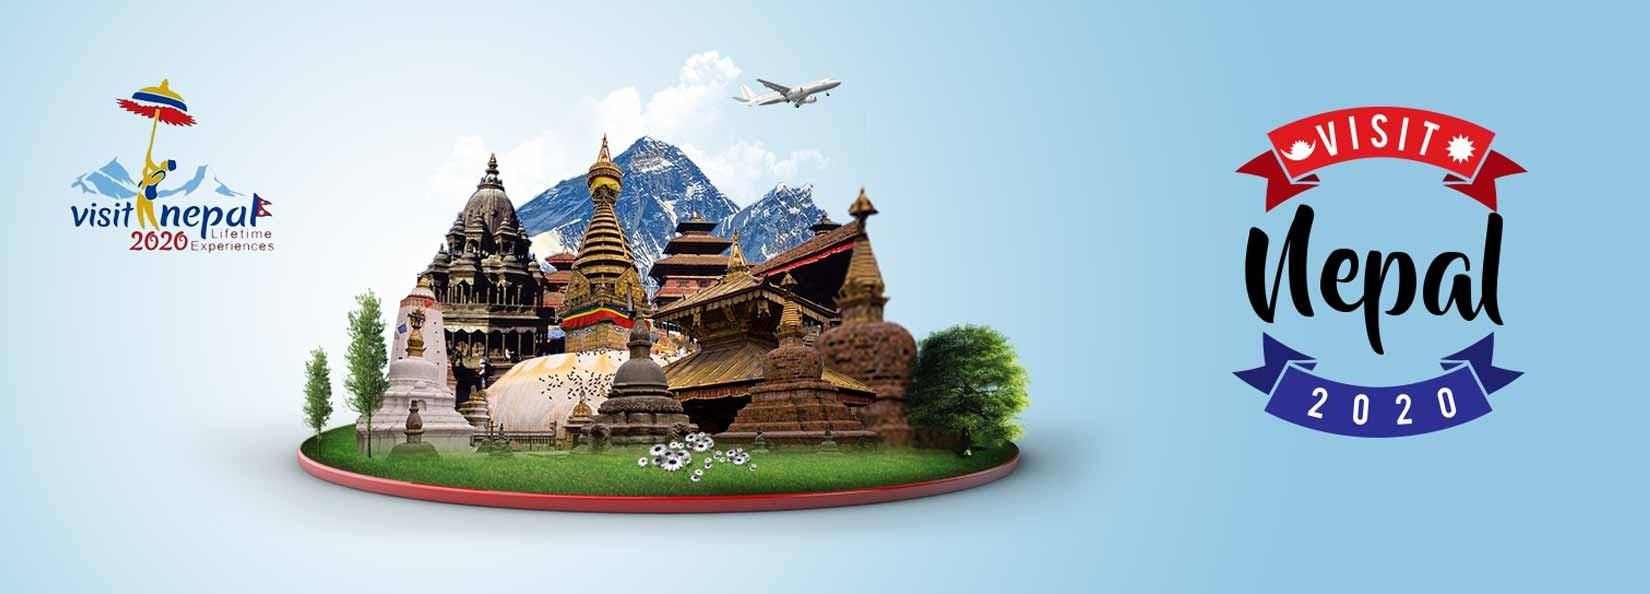 shopinholidays-visit-nepal-2020